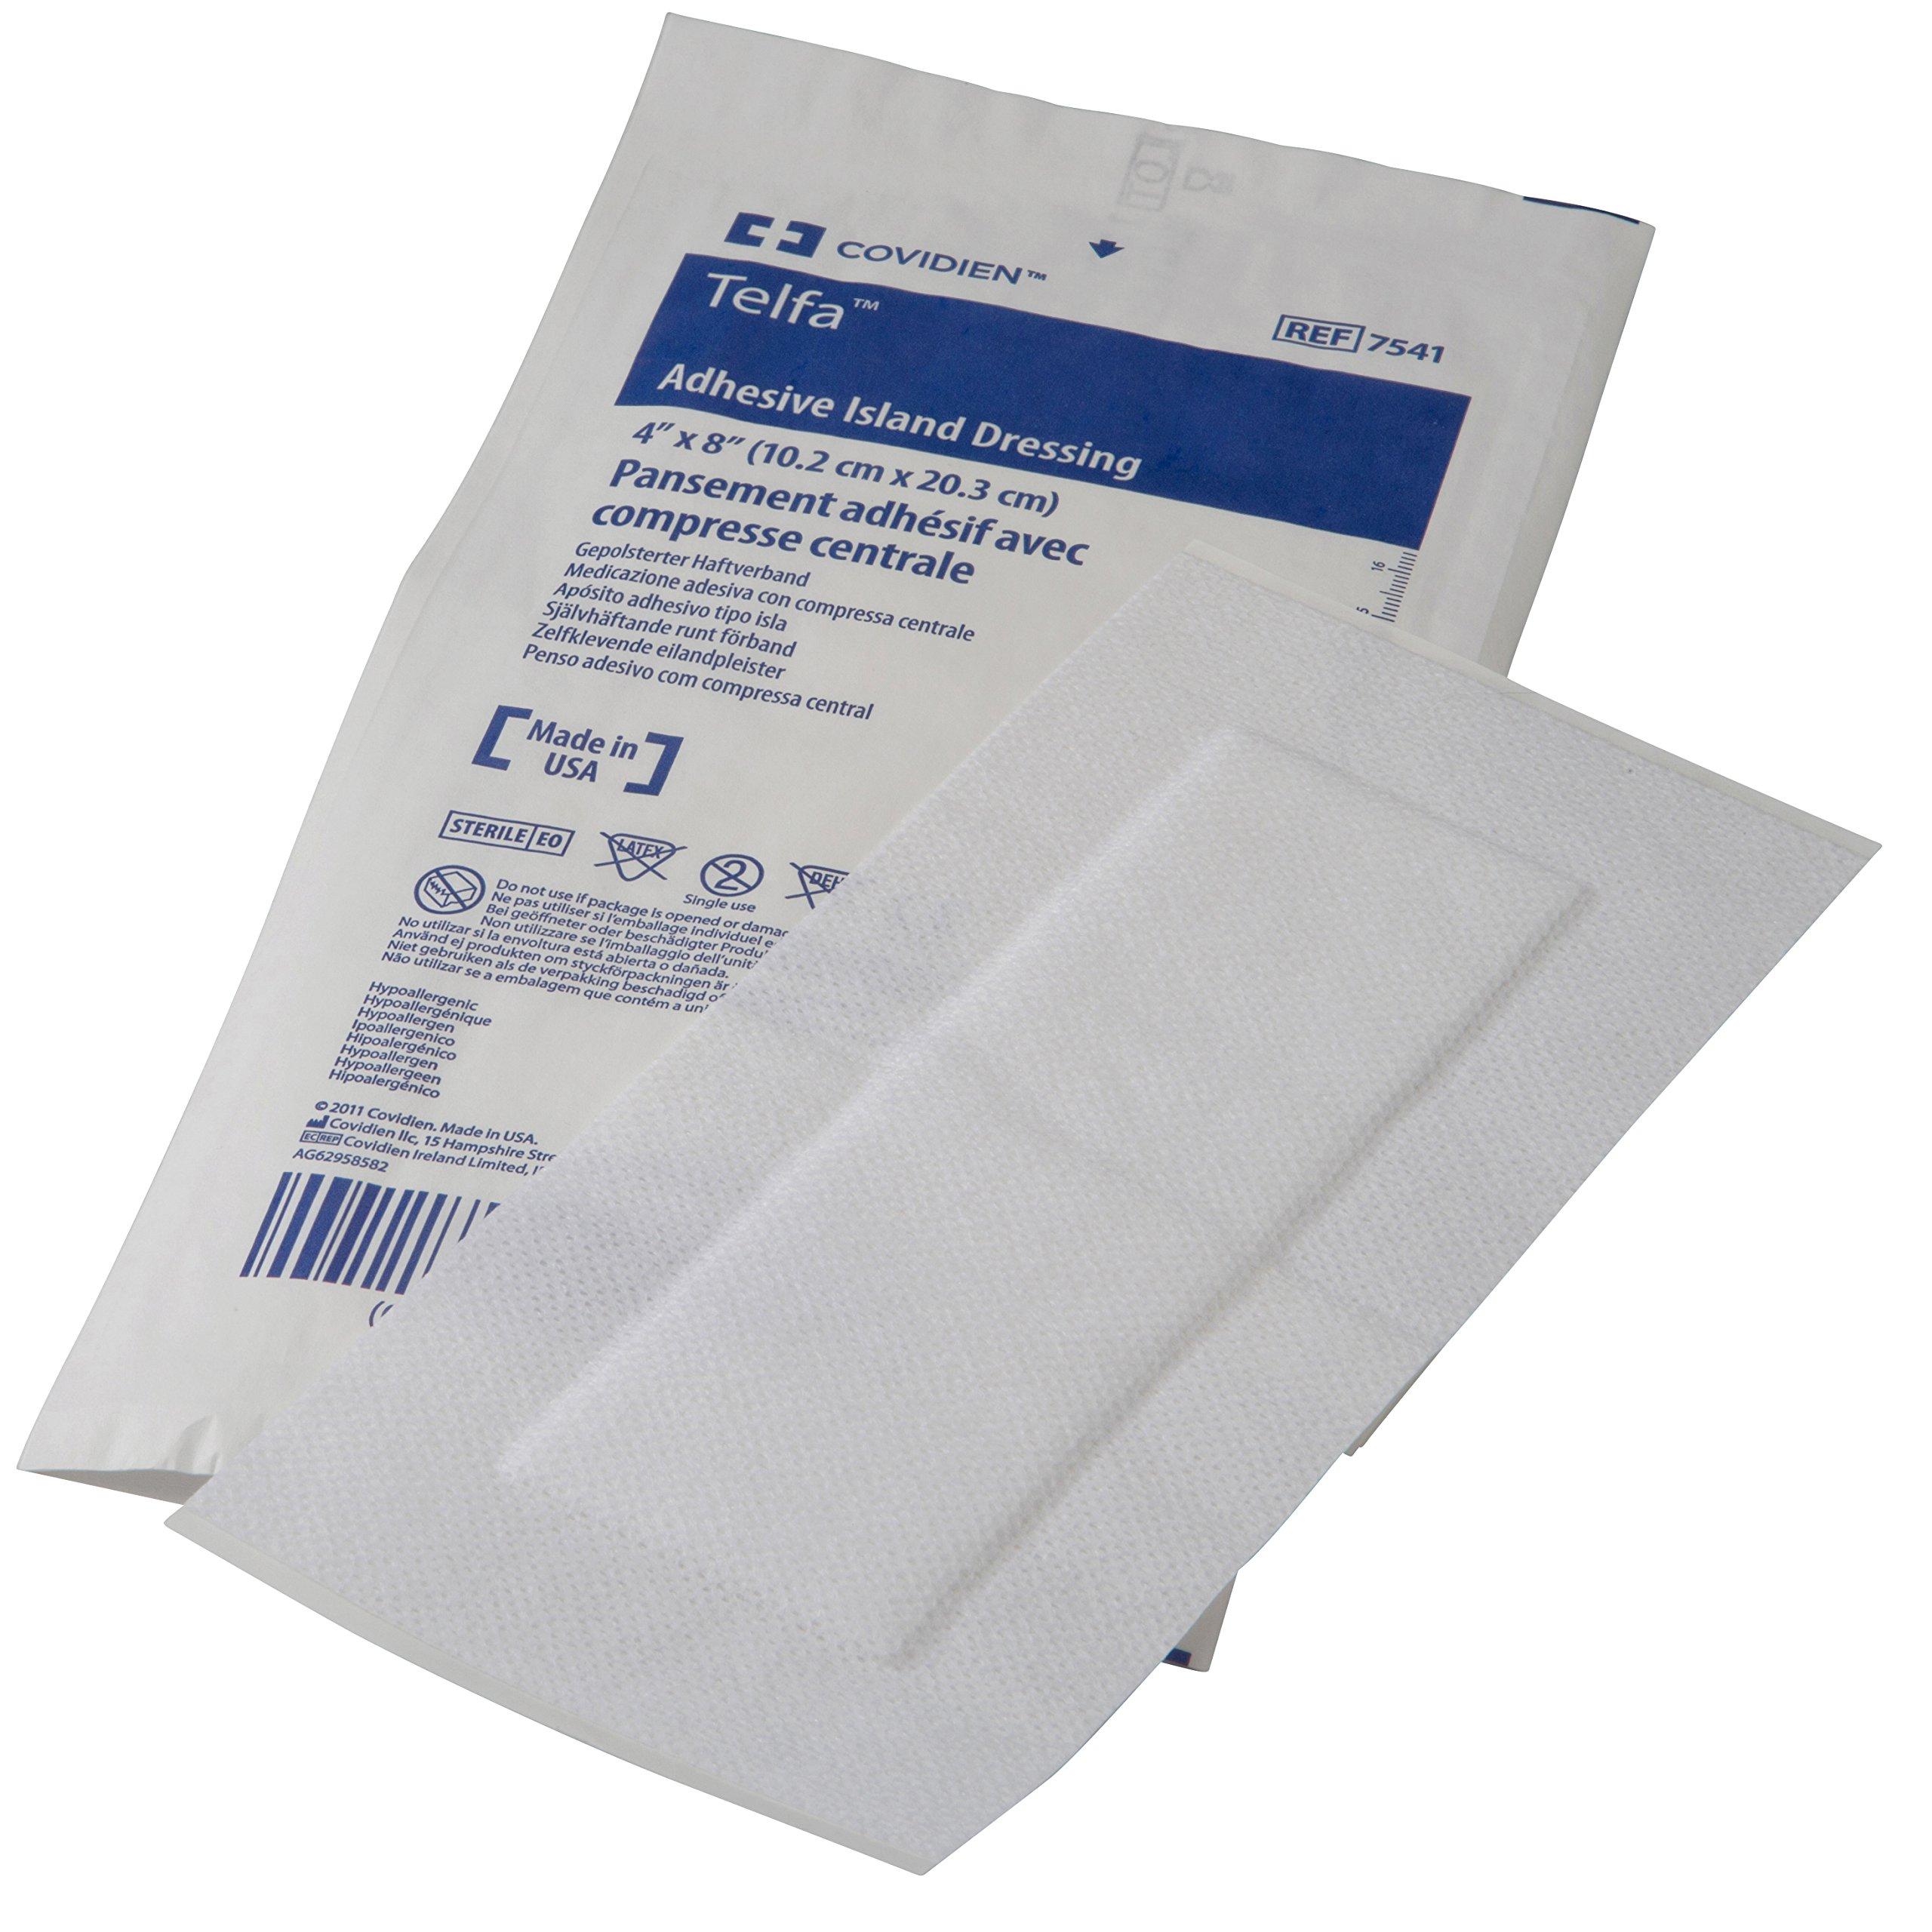 Covidien 7541 Telfa Adhesive Island Dressing, Sterile 1's in Peel-Back Package, 4'' x 8'' (Pack of 25) by COVIDIEN